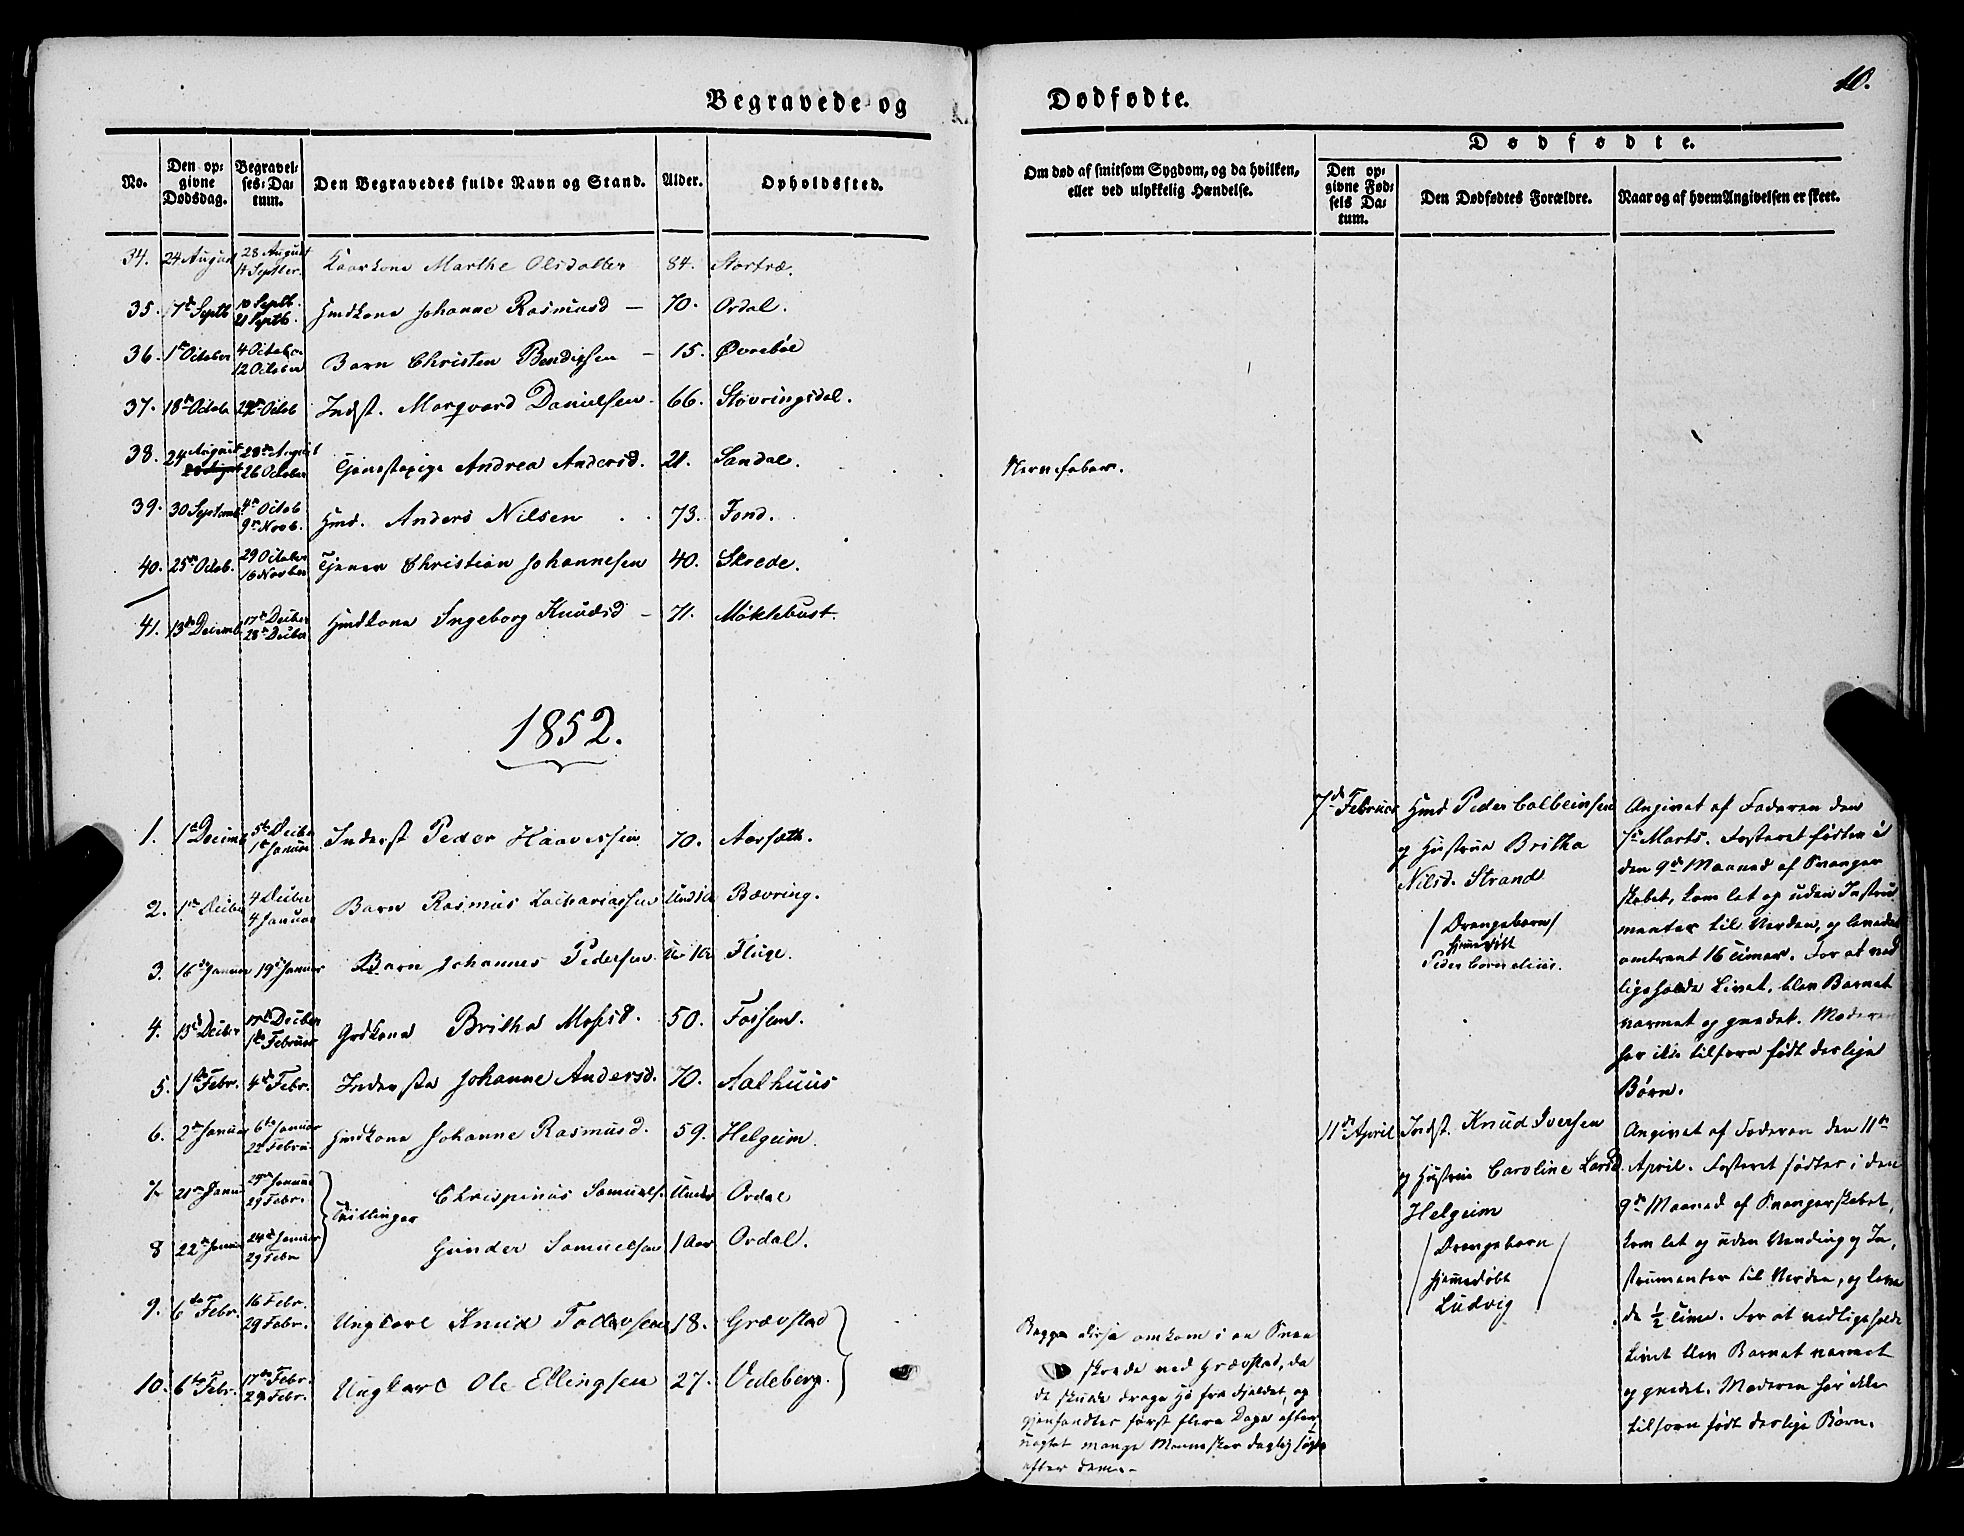 SAB, Jølster sokneprestembete, H/Haa/Haaa/L0010: Parish register (official) no. A 10, 1847-1865, p. 10